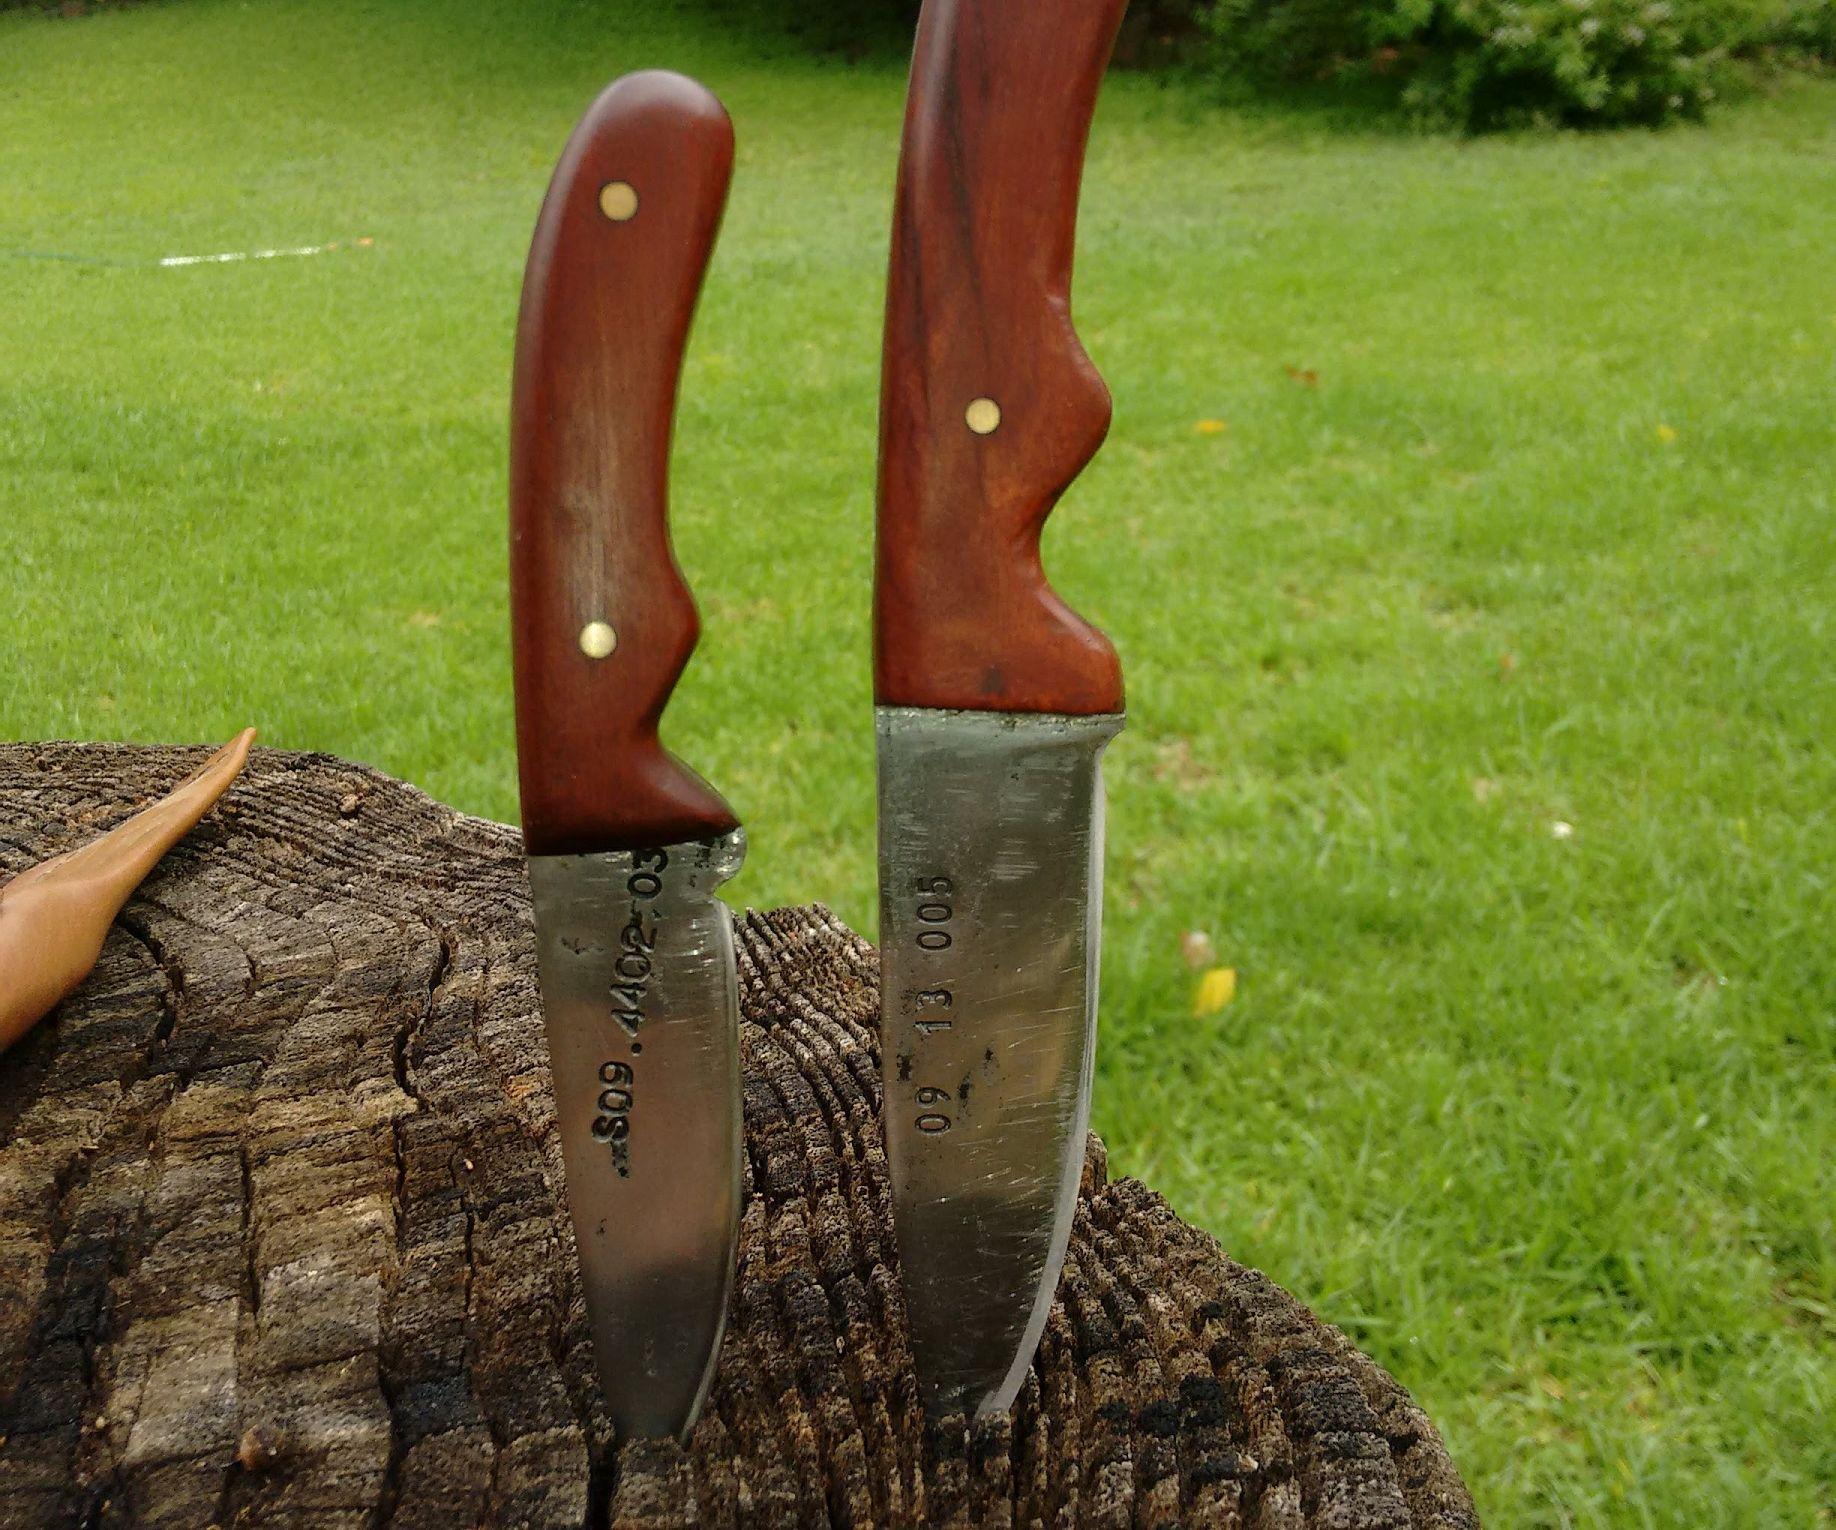 Lawn Mower Blade to Custom Knife